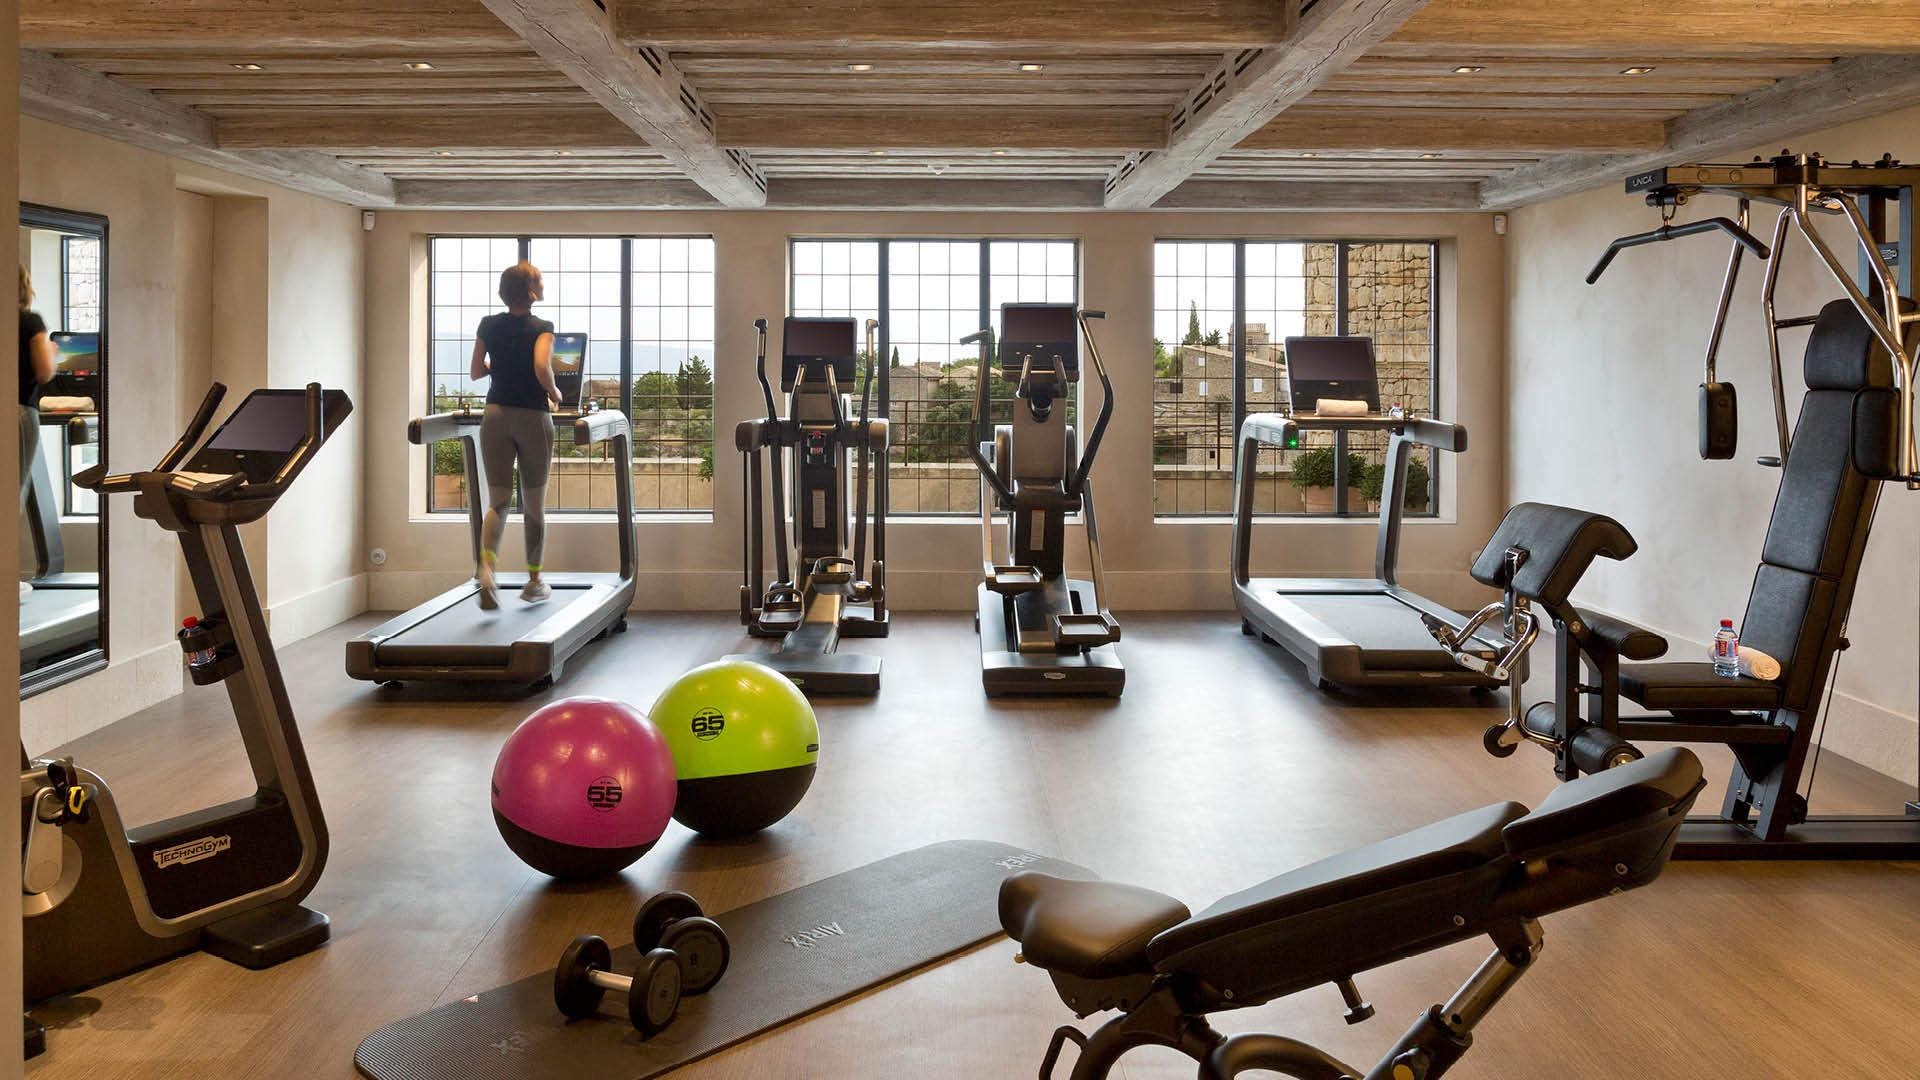 palace hotel de luxe 5 etoiles la bastide de gordes luberon provence spa sisley salle fitness